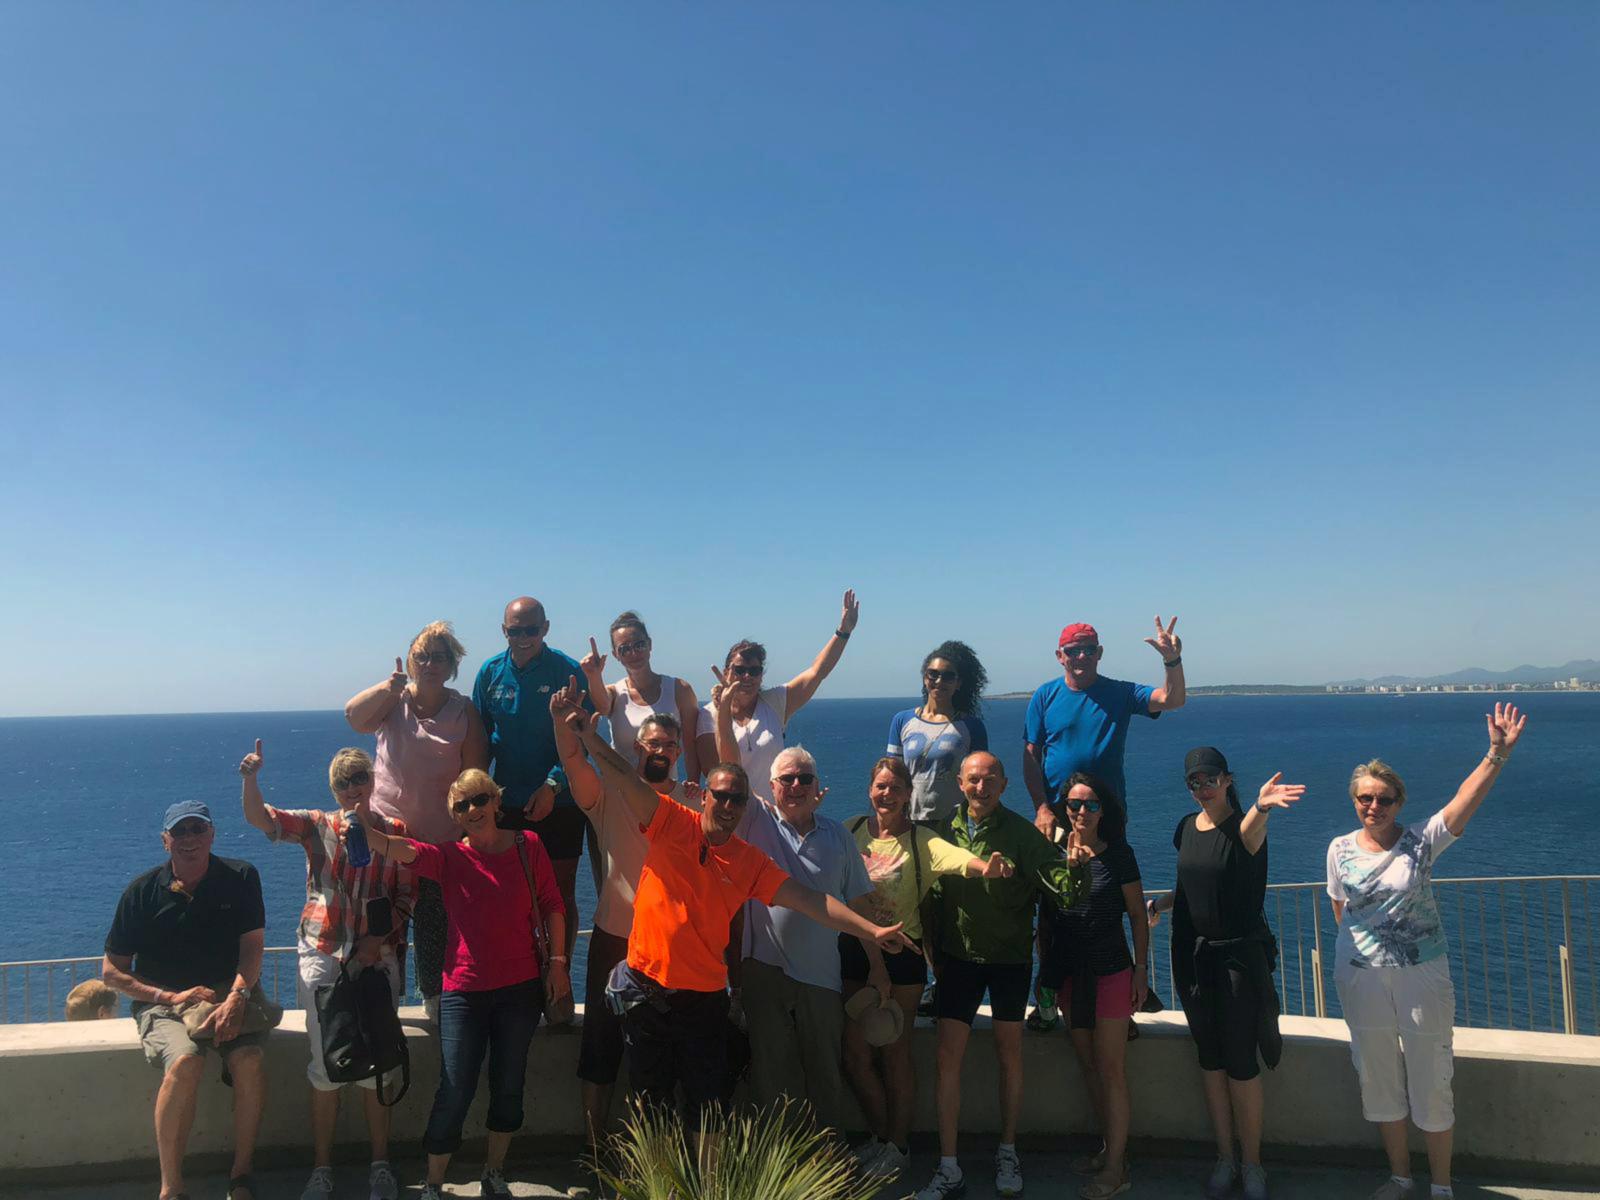 Alquiler de bicicletas Mallorca. Mirador Costa de los Pinos2.IMG